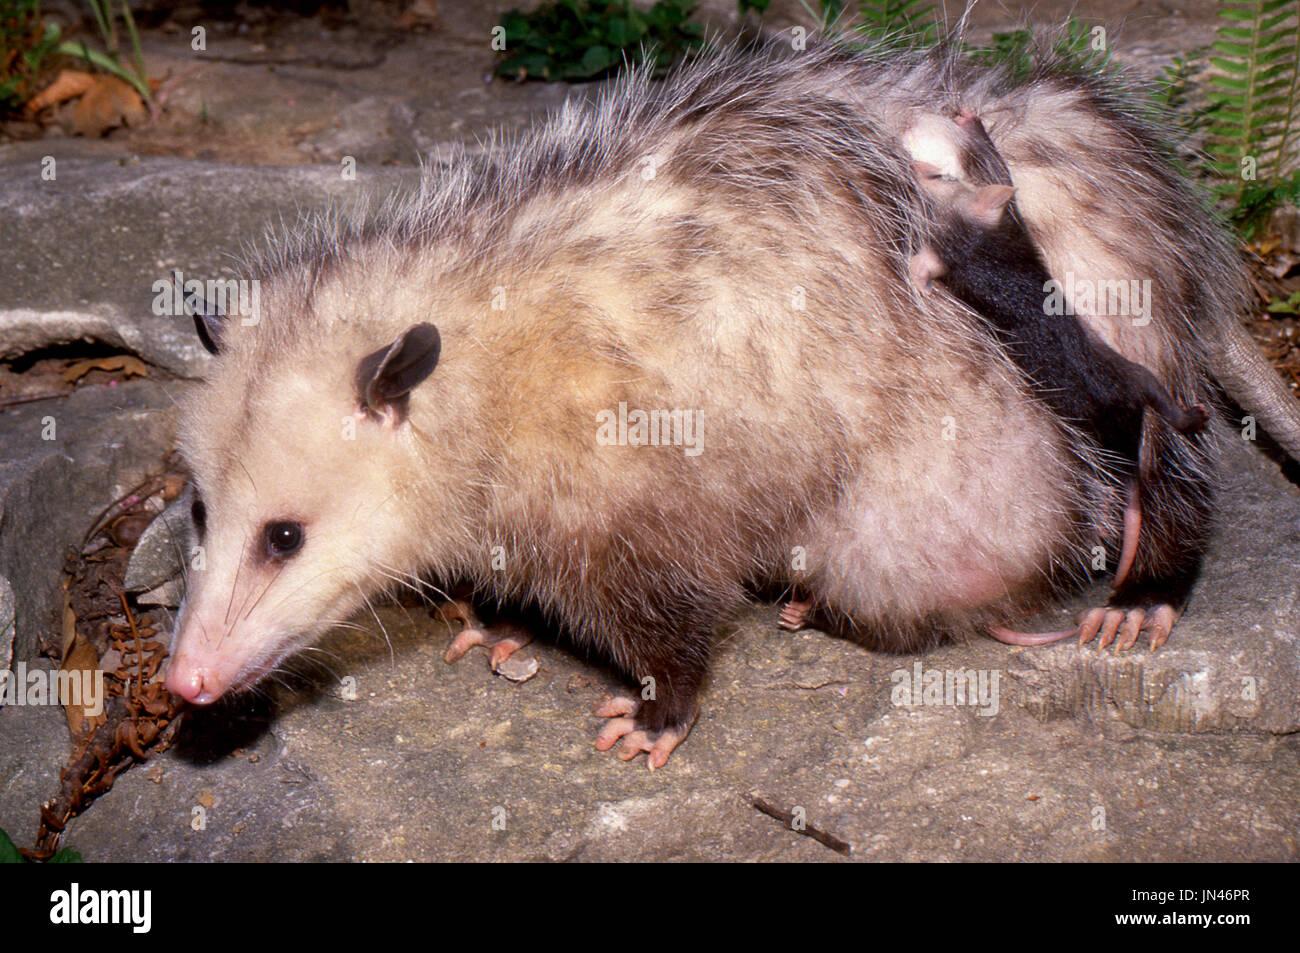 Possum (Didelphimorphia) madre con bebés aferrándose a su espalda, Missouri, EE.UU. Imagen De Stock